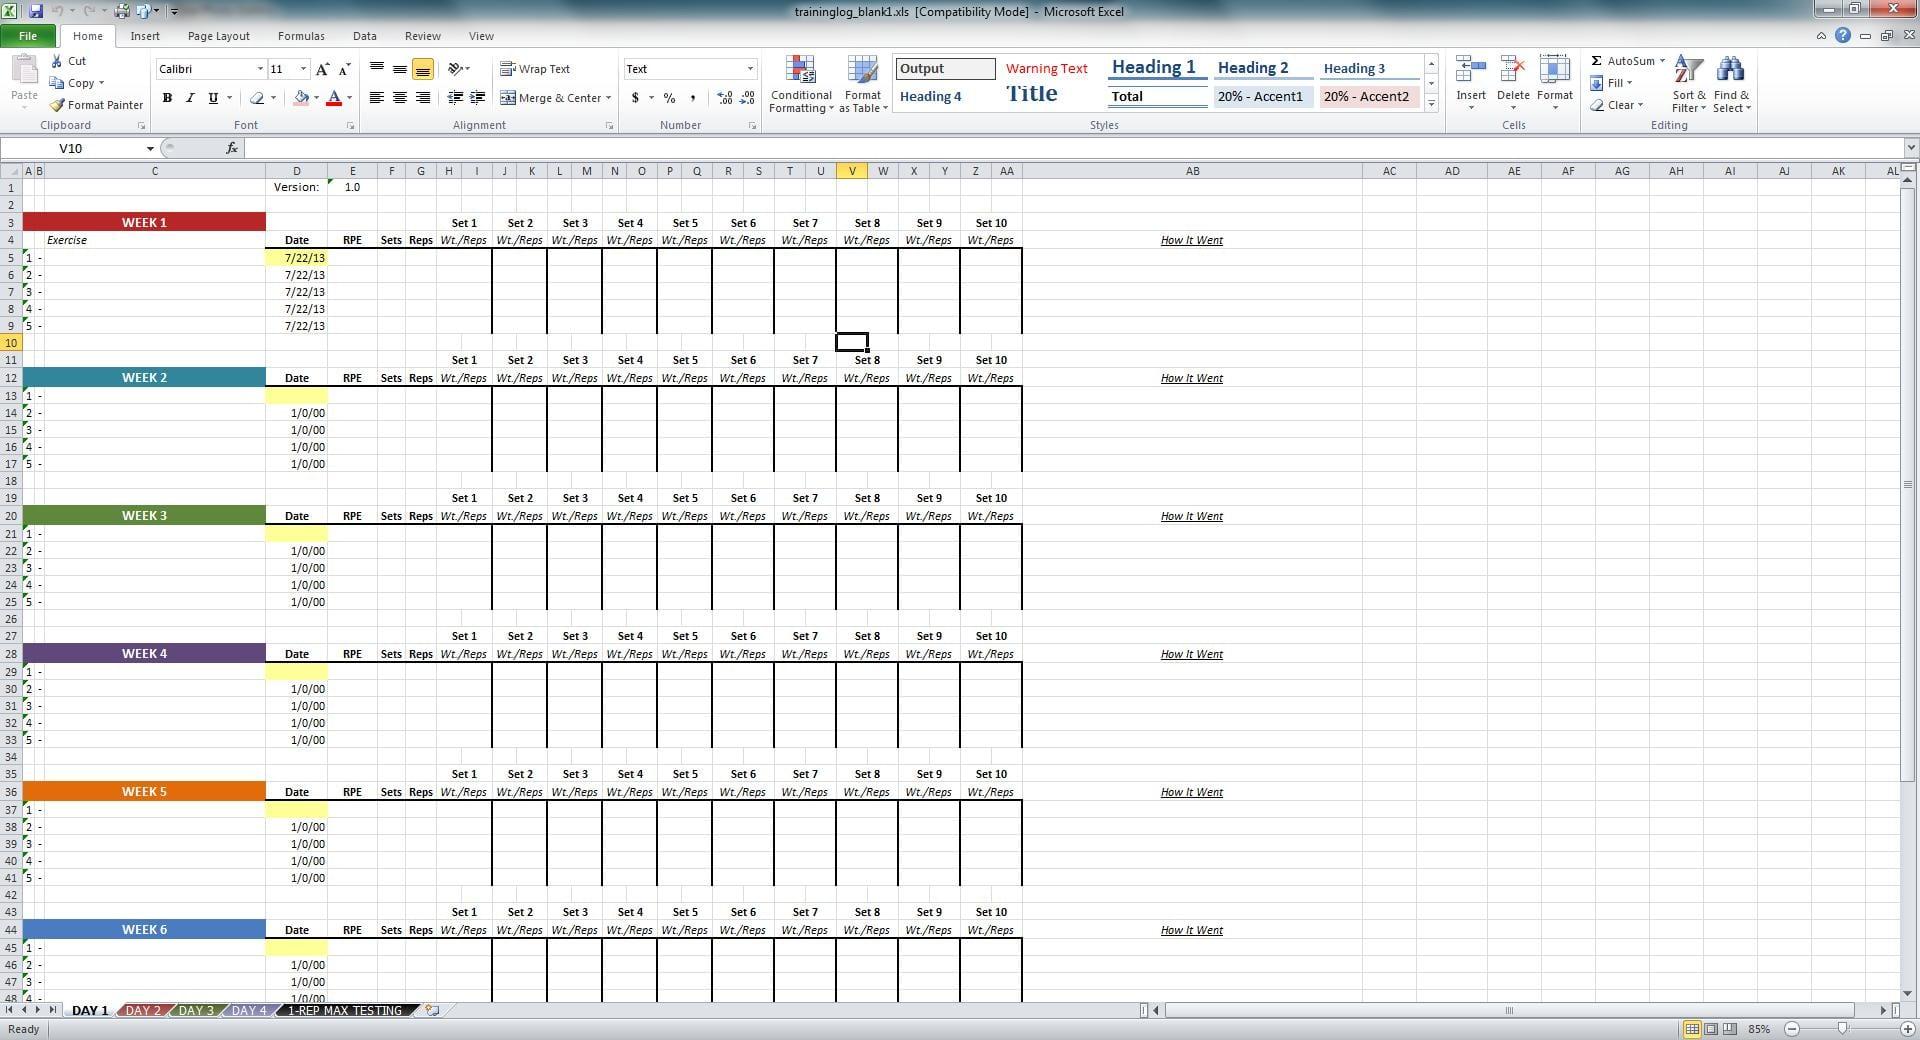 Excel Training Matrix Examples Spreadsheets Training Spreadsheet Template Spreadsheet Templates for Busines Spreadsheet Templates for Busines Employee Training Spreadsheet Template Excel